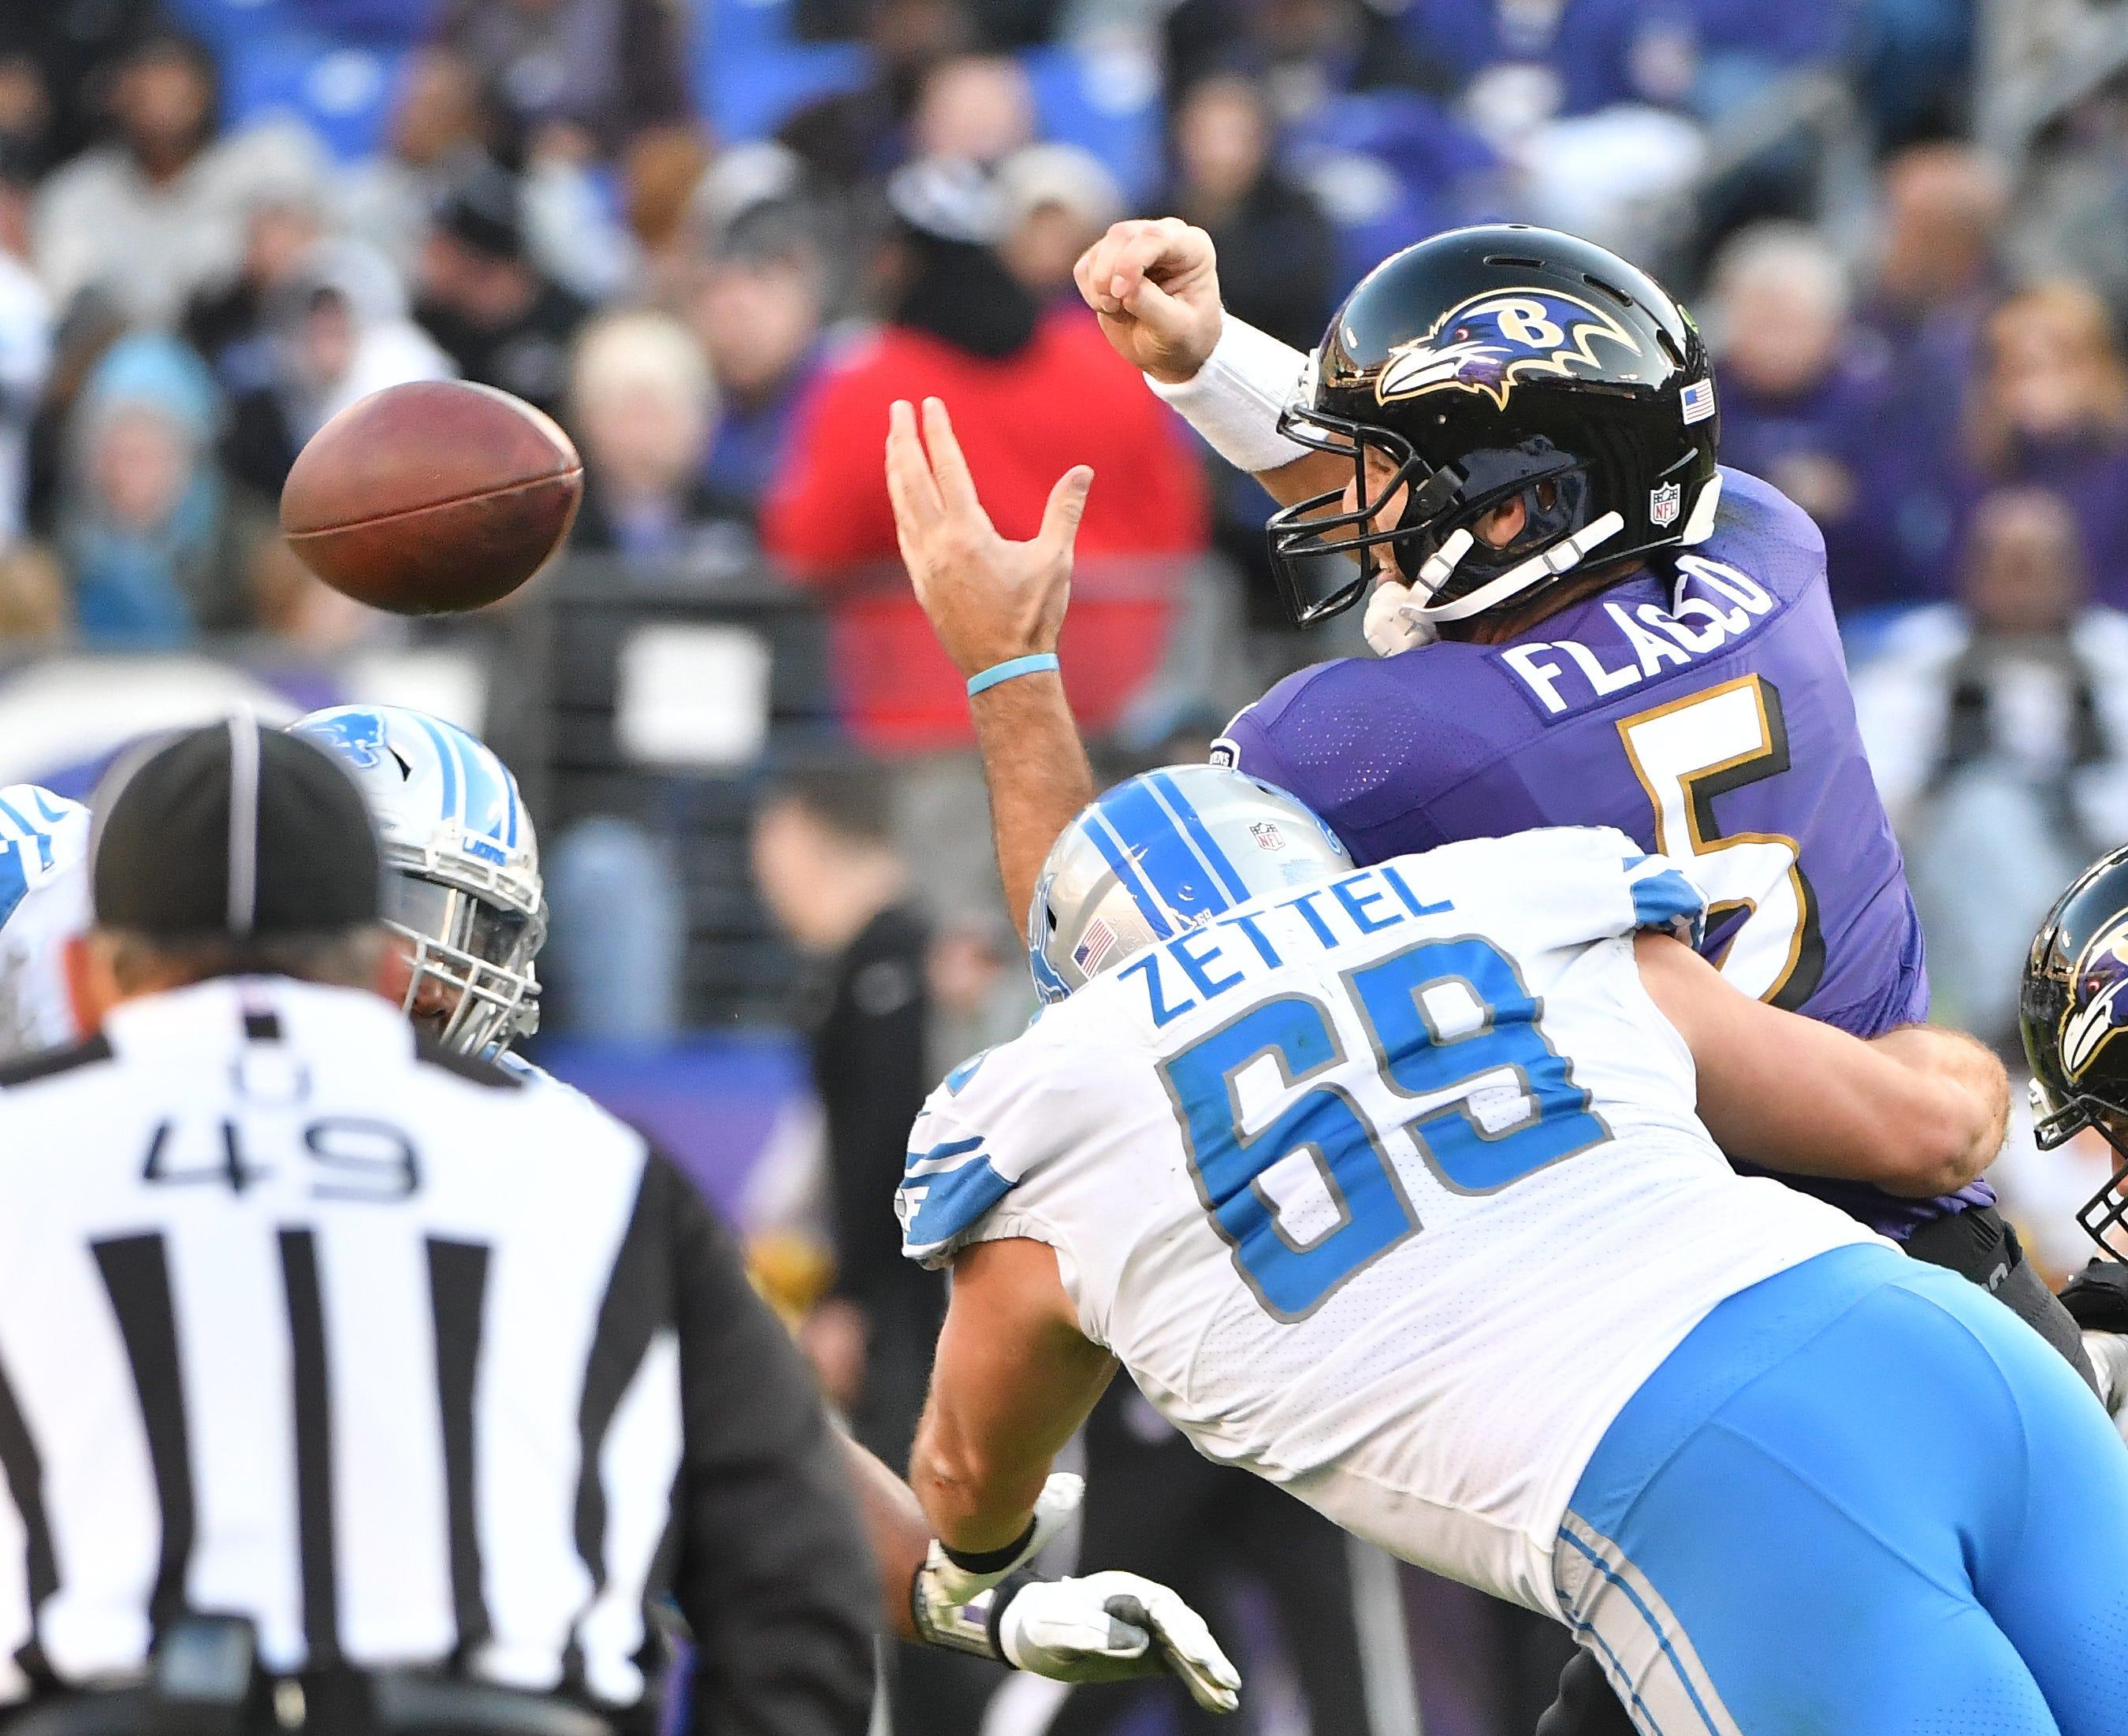 Lions' Anthony Zettel hits Ravens quarterback Joe Flacco,